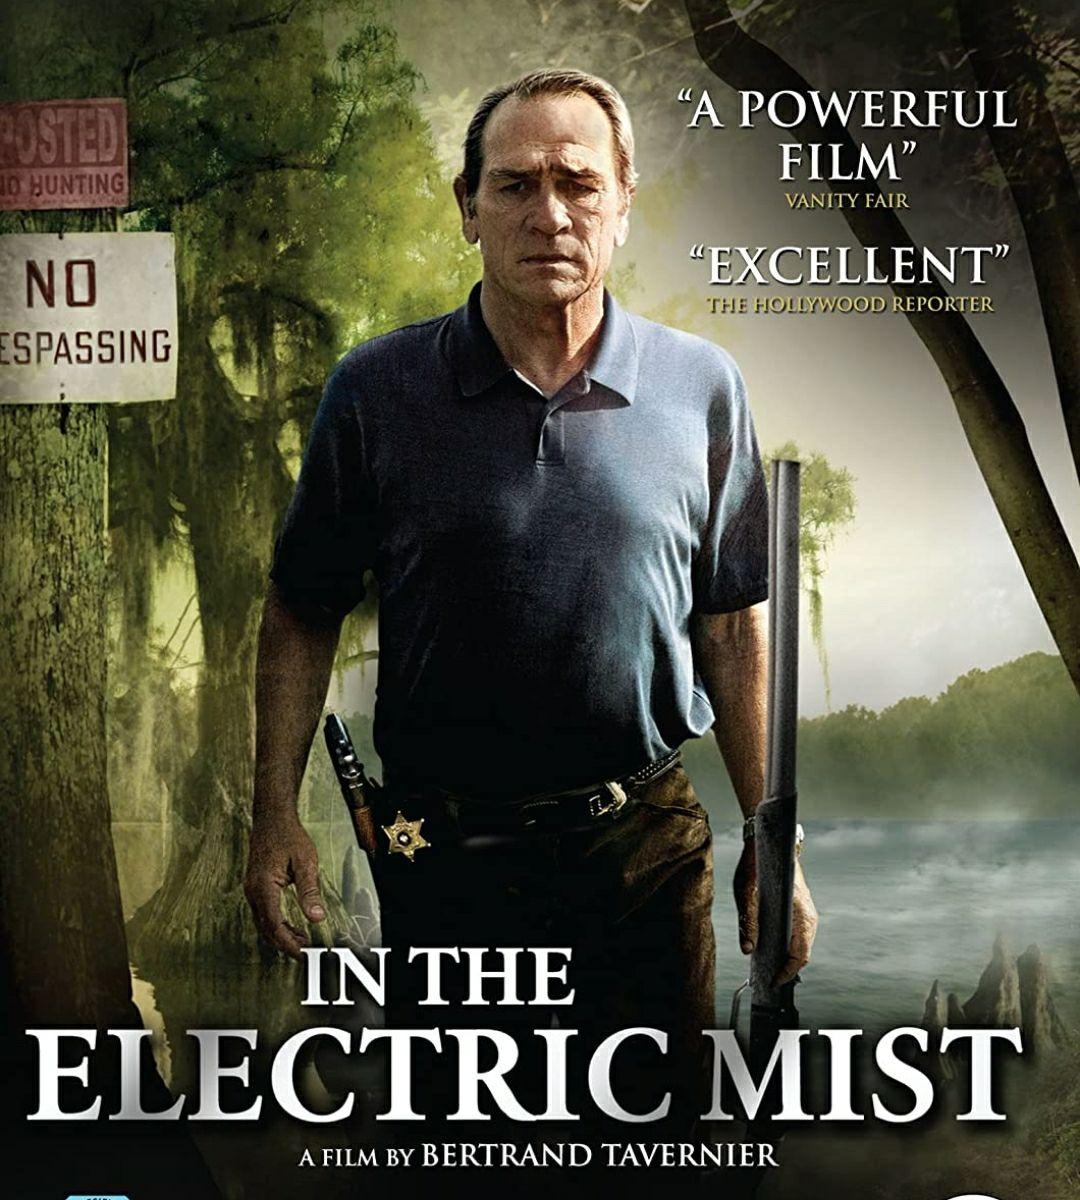 [ServusTV Mediathek] In the Electric Mist mit Tommy Lee Jones und John Goodman kostenlos streamen